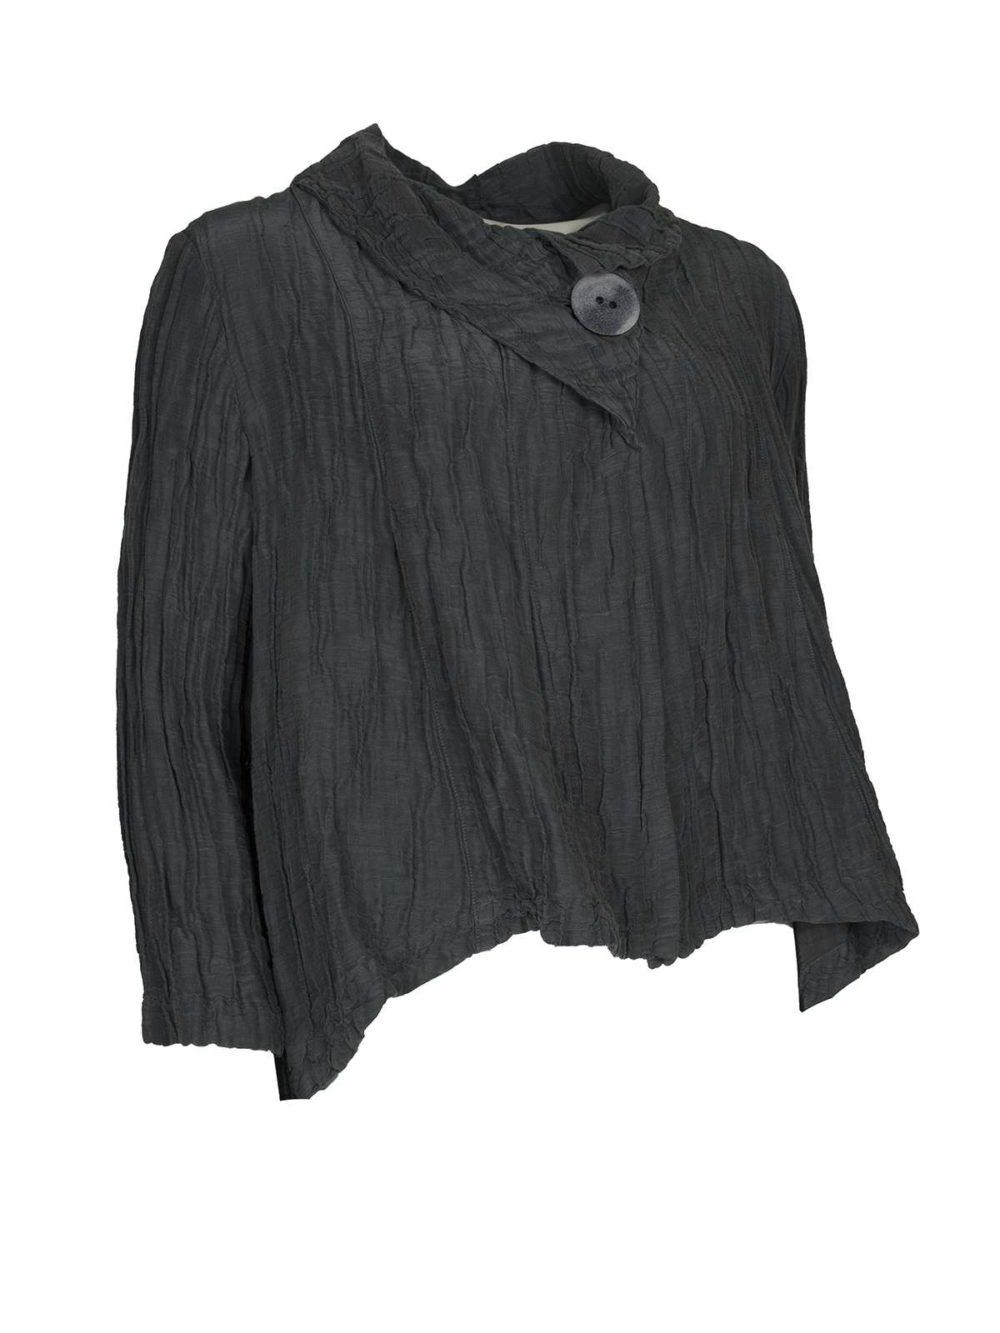 Jacket 7286 Grizas Katie Kerr Women's Clothing